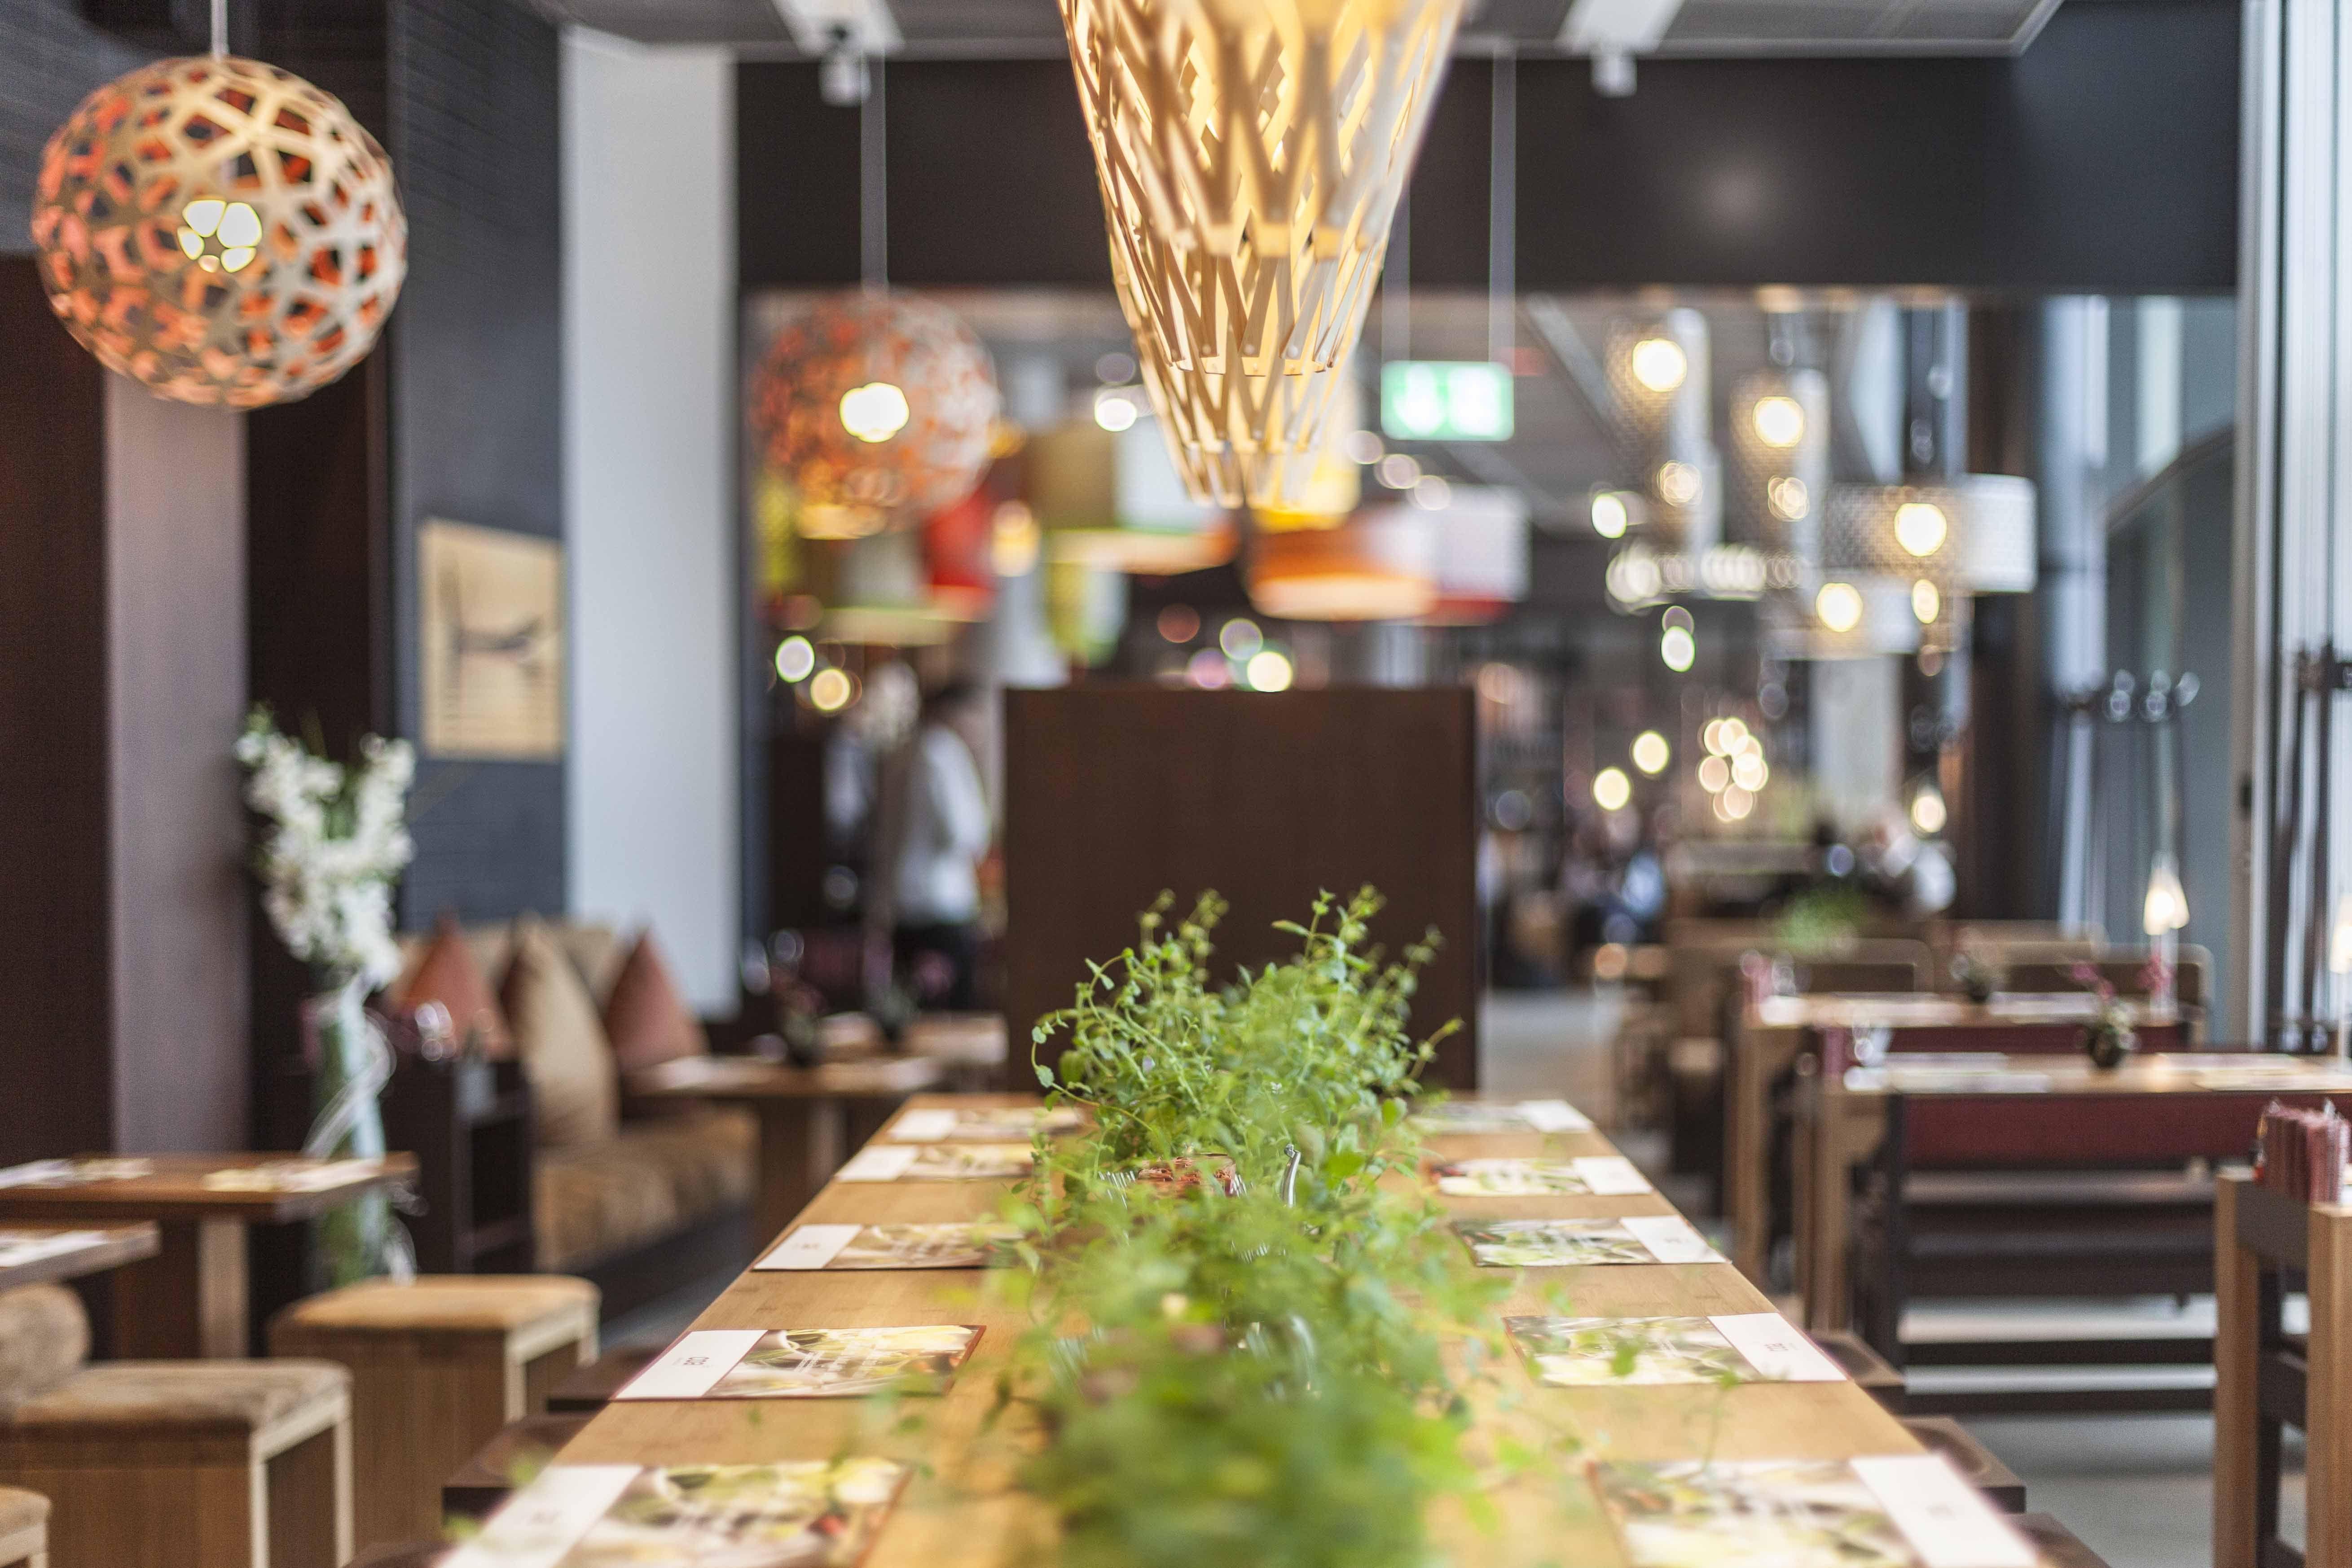 Innenarchitektur Essen coa food bar coa interior design inspired design